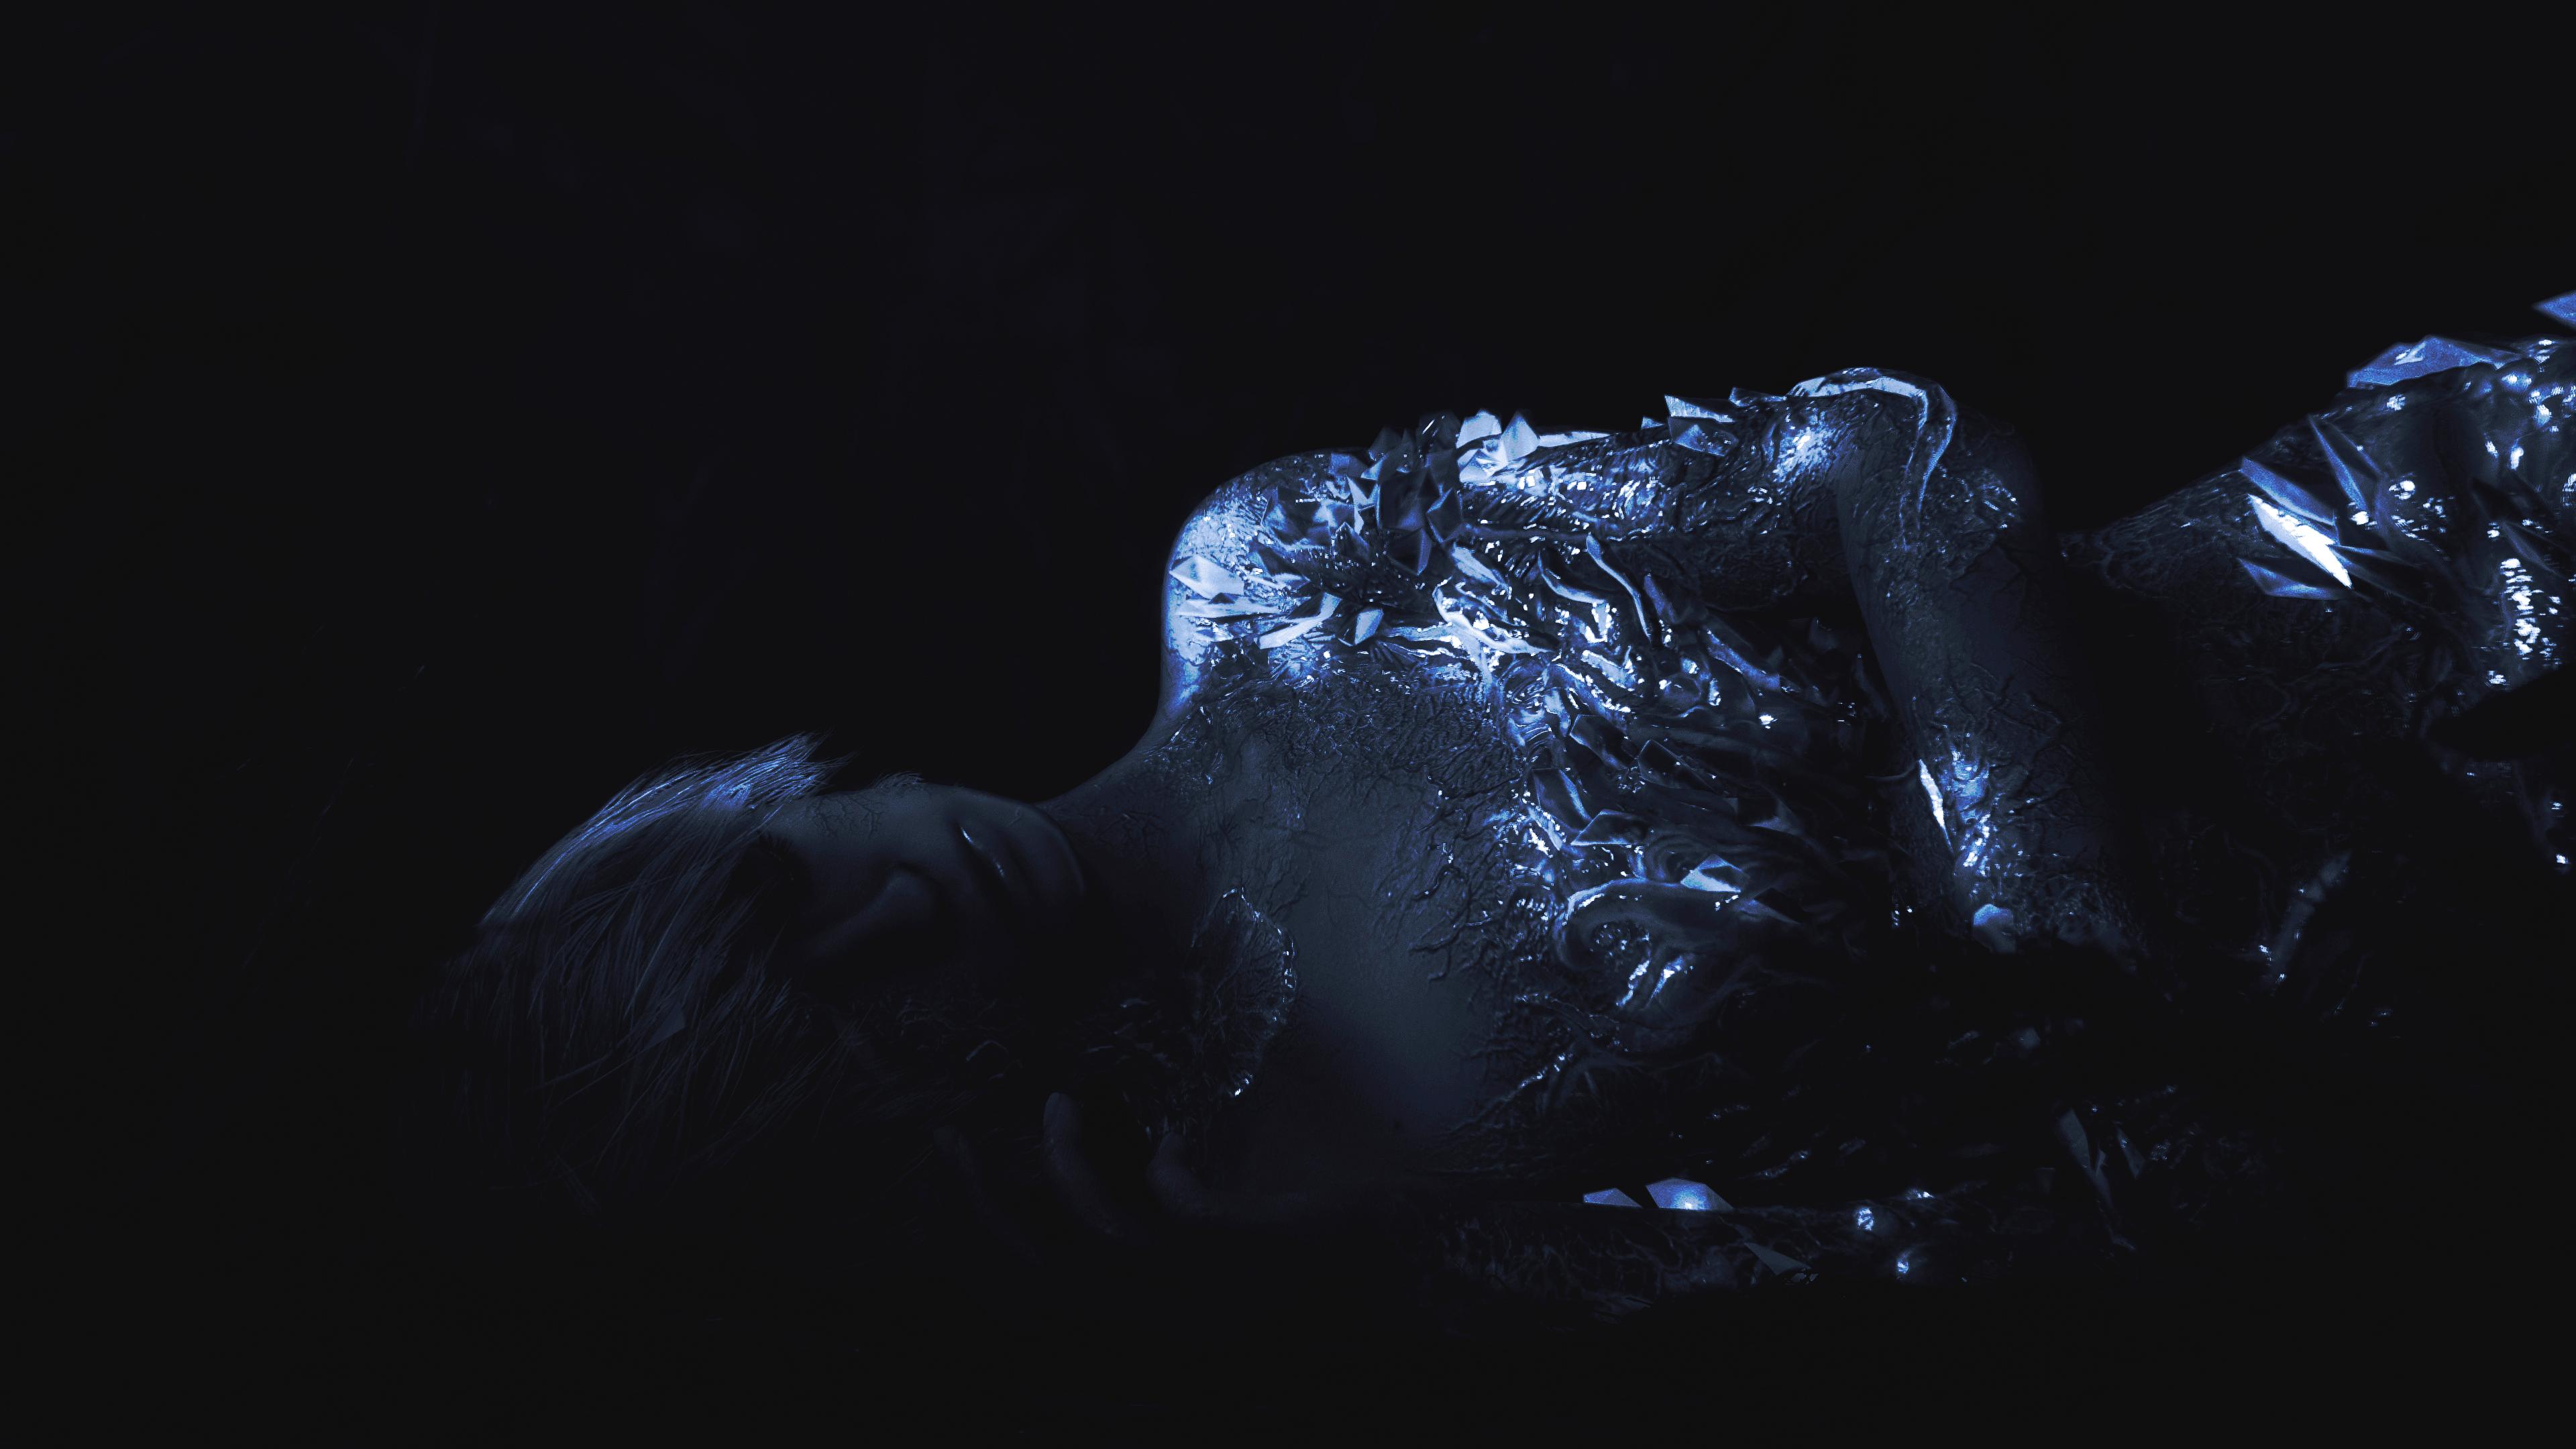 General 3840x2160 resident evil 7 dark glowing women lying down video games Resident Evil